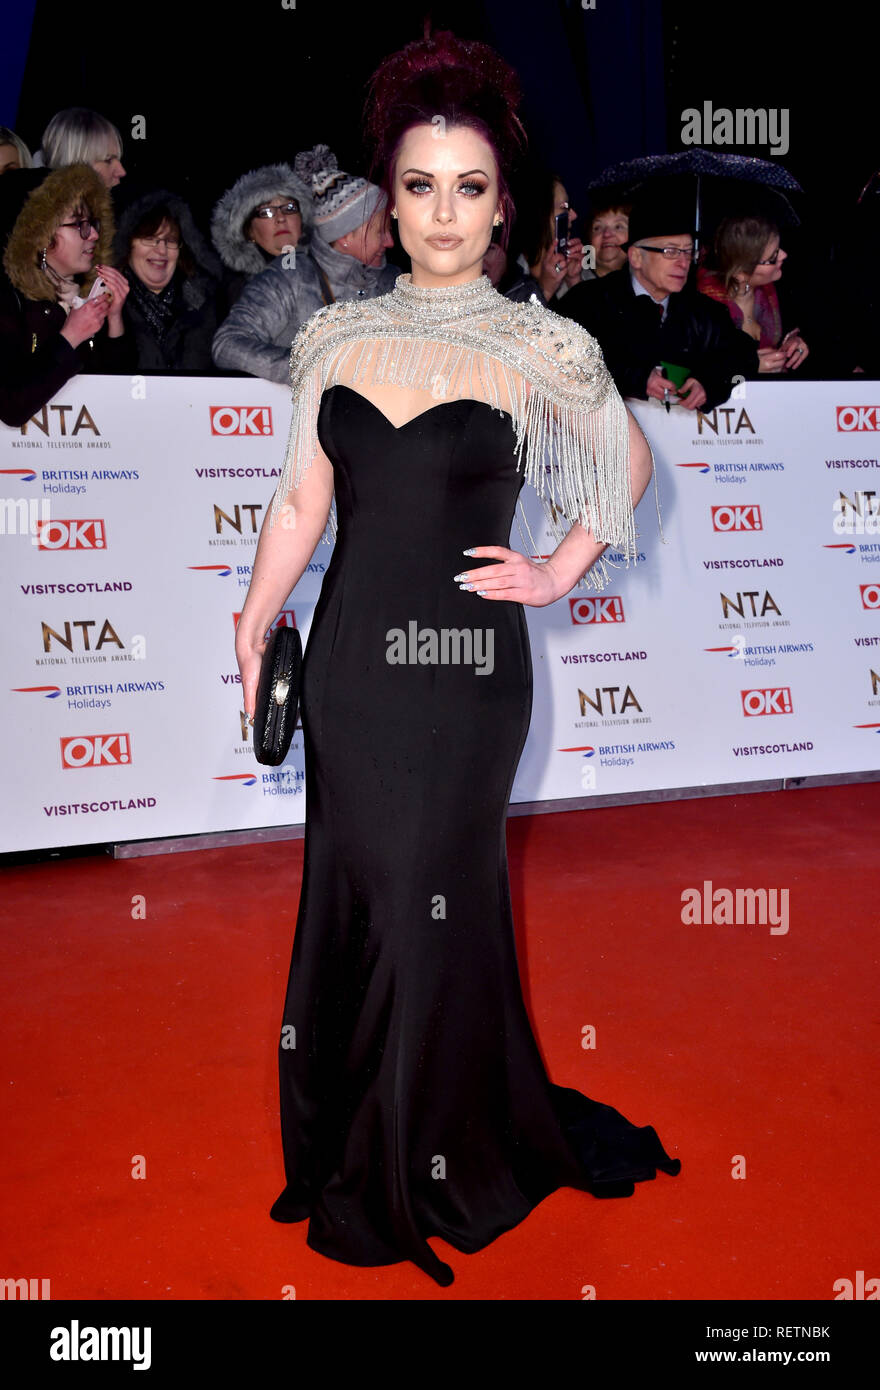 Ass 2019 Shona McGarty naked photo 2017